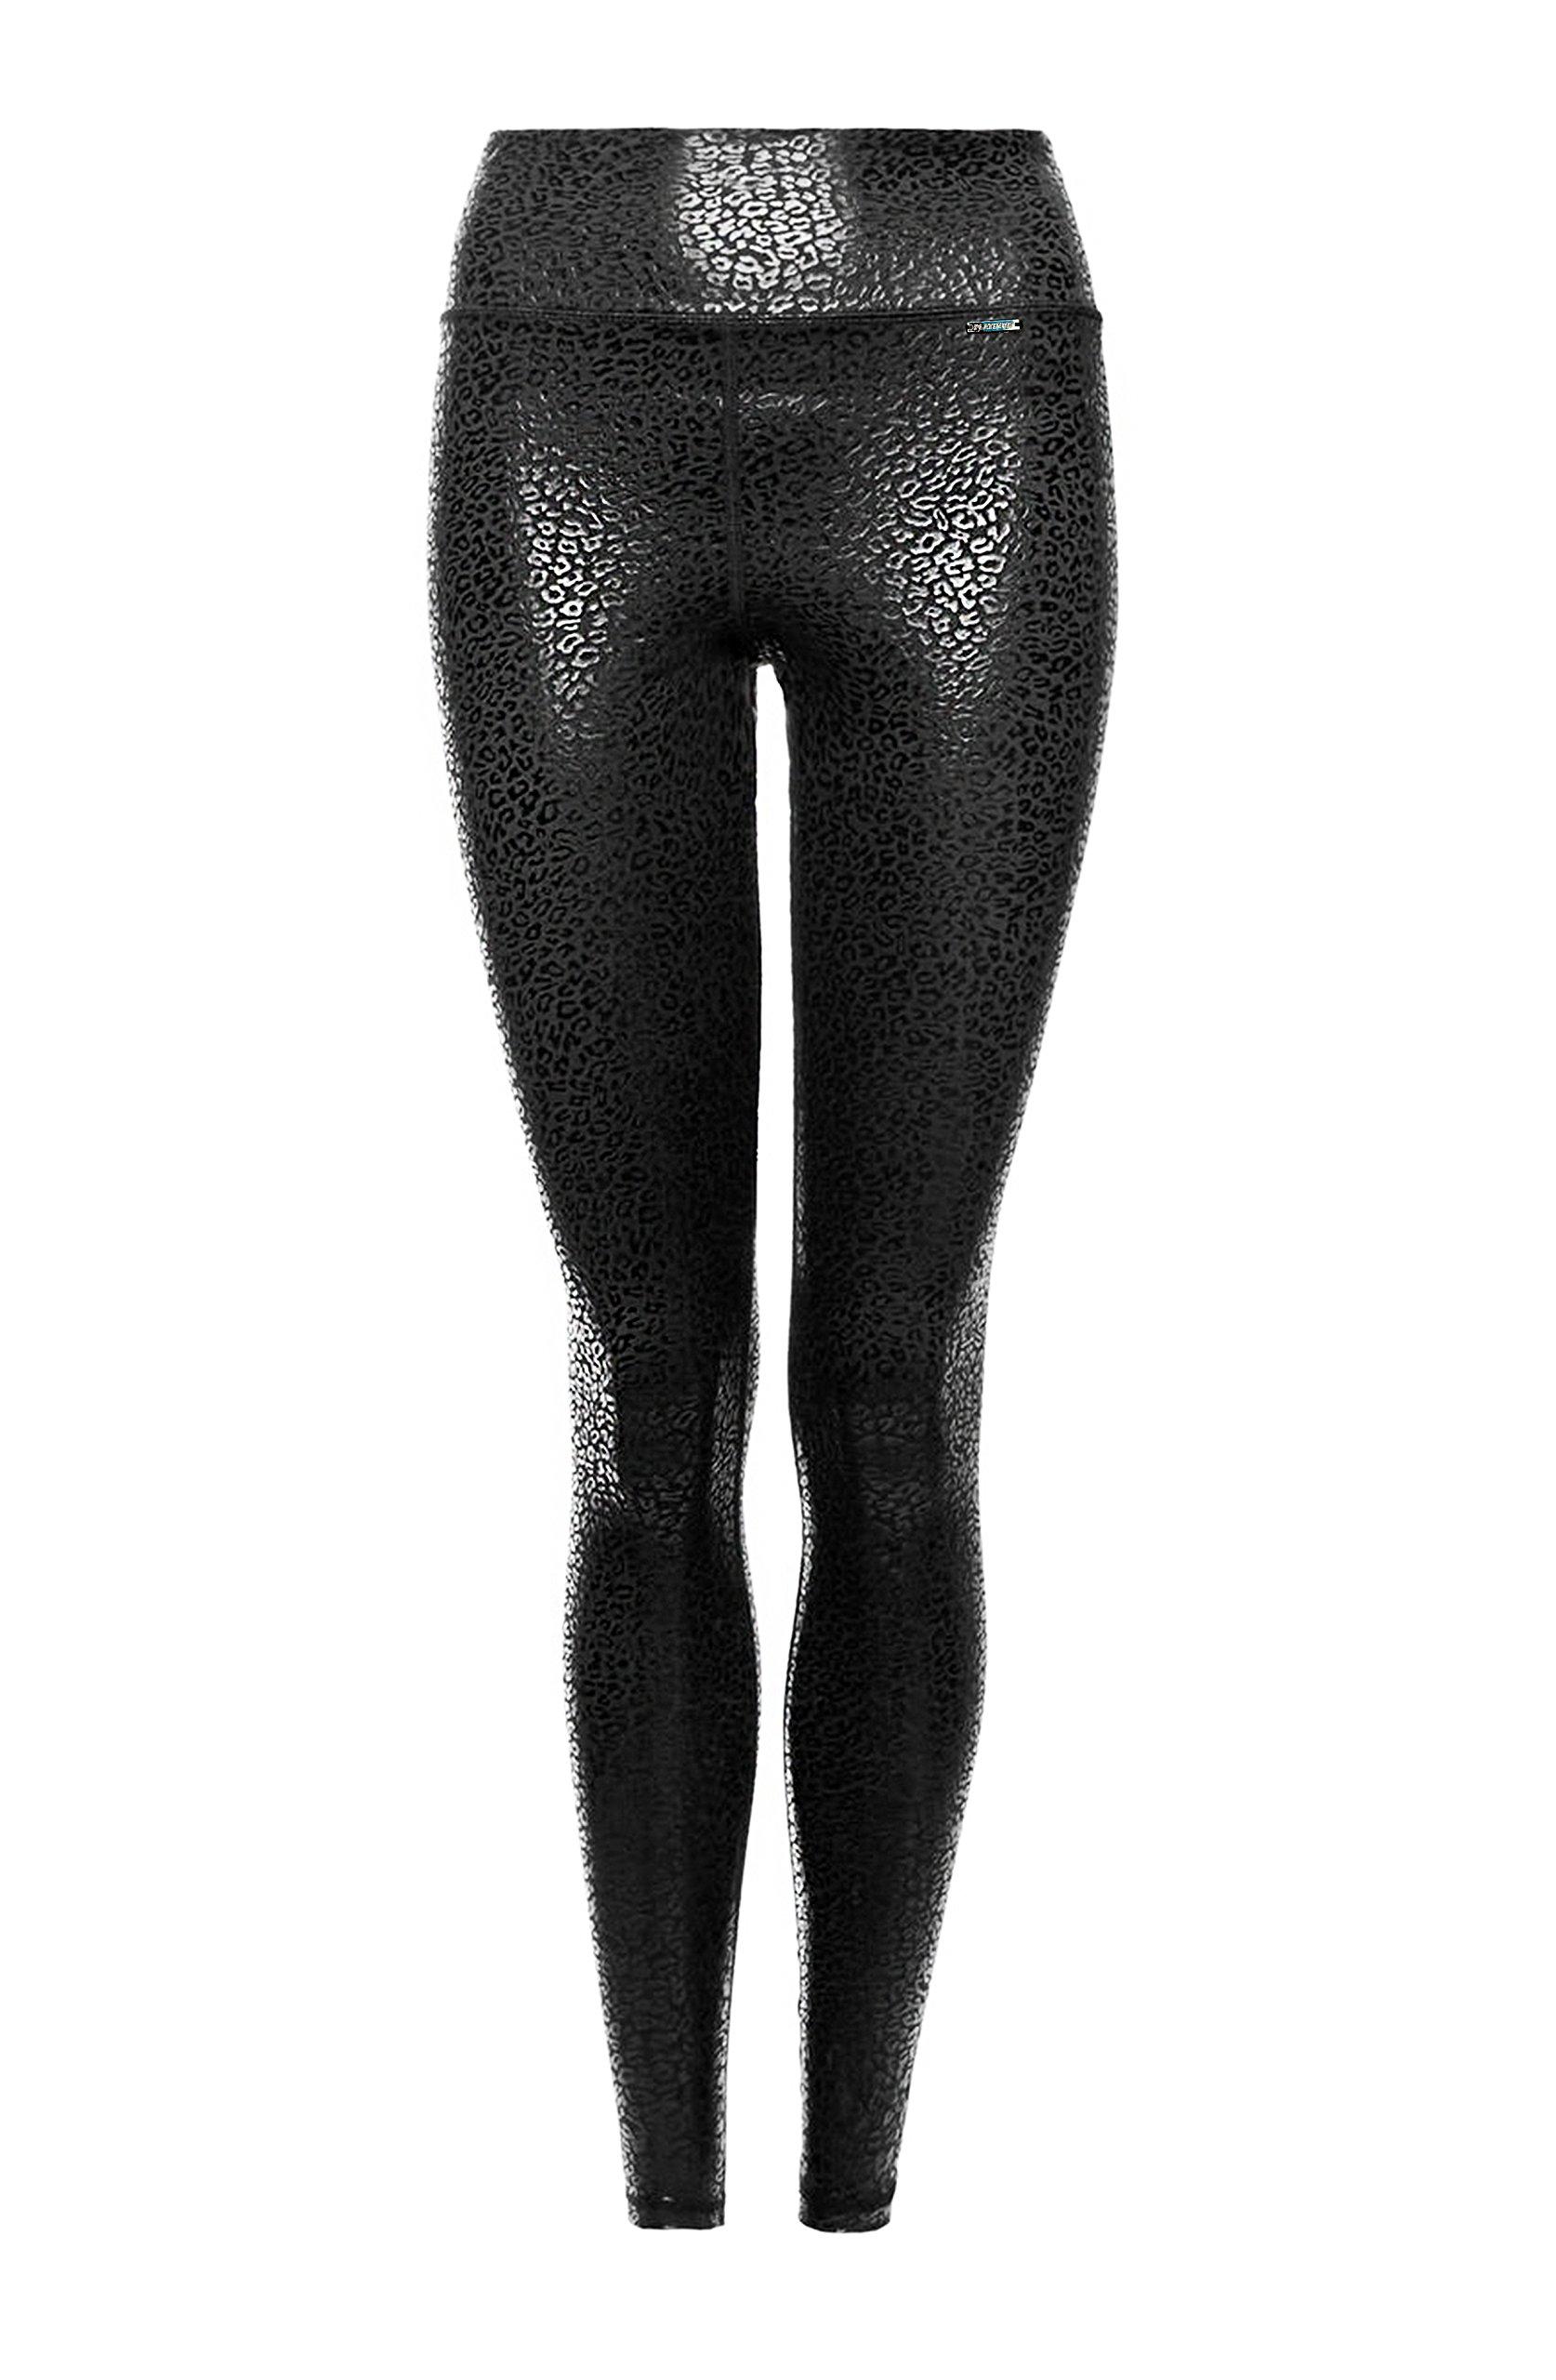 Platinum Sun Leopard Print Compression Womens Athletic Leggings Black - XL by Platinum Sun